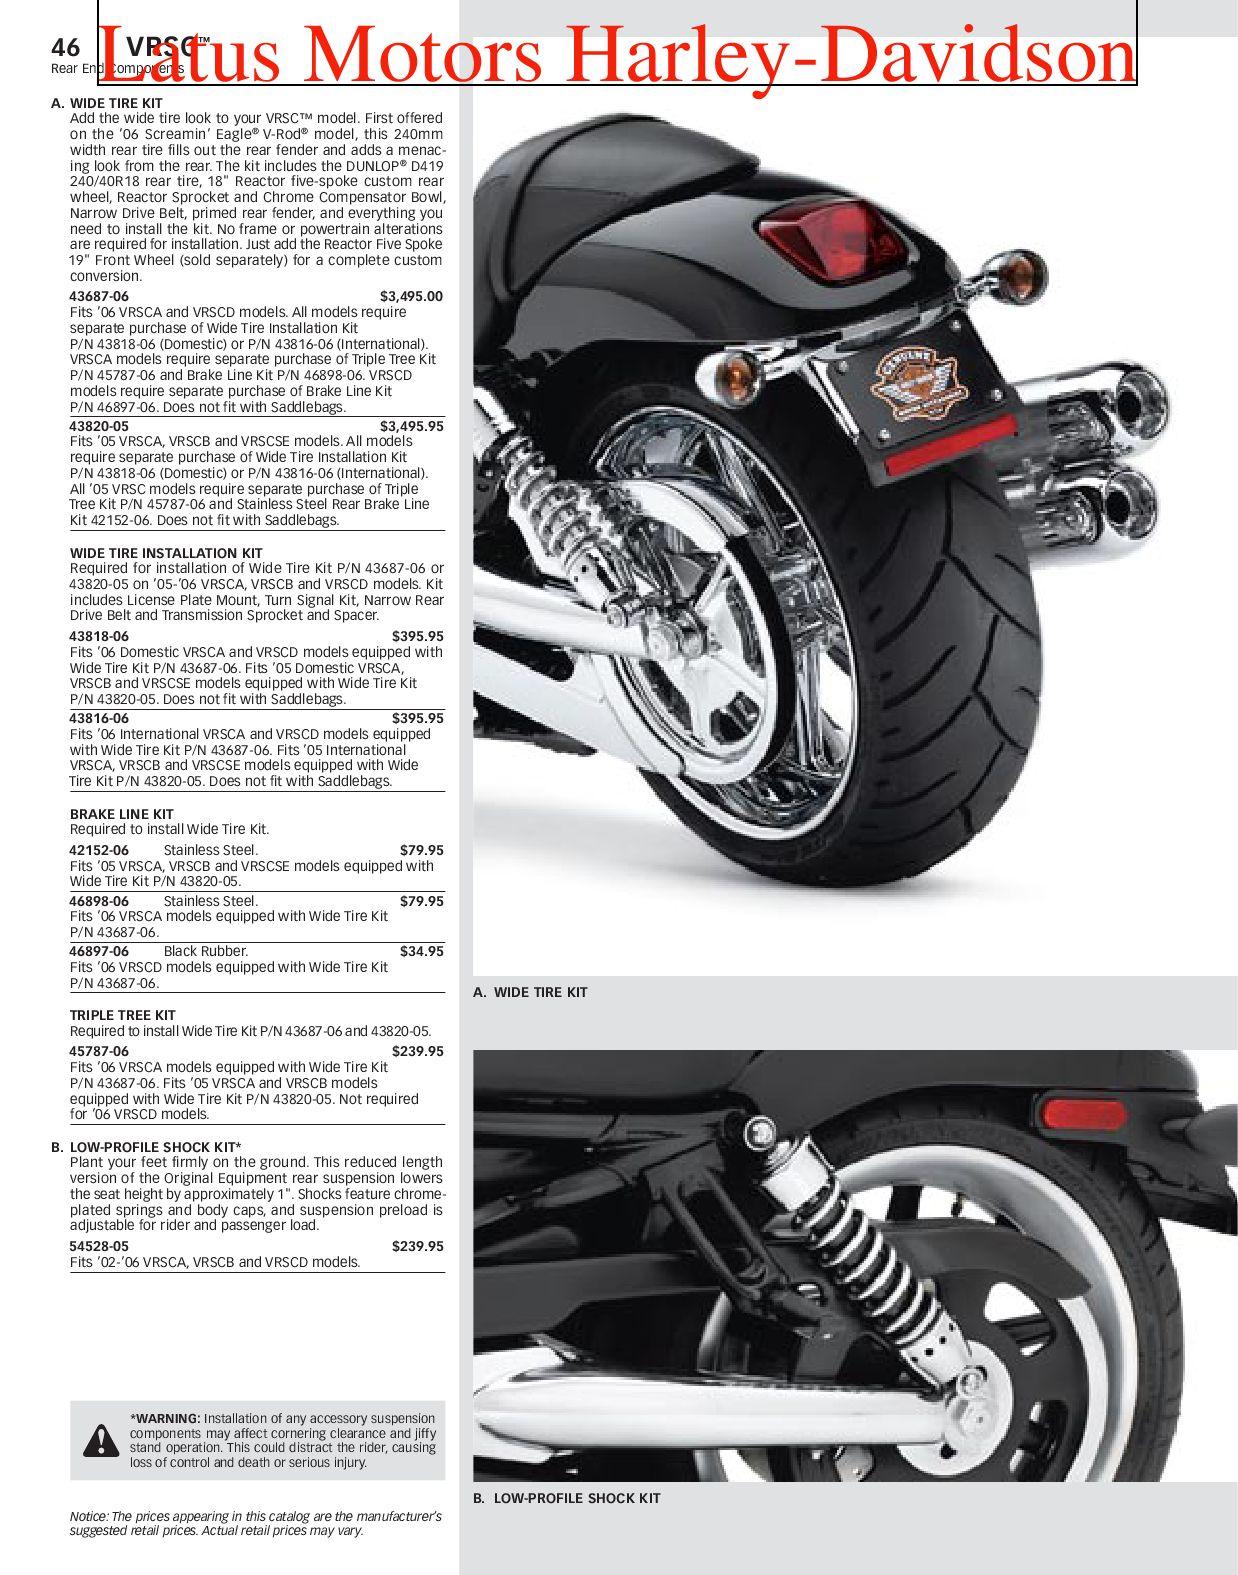 Iron Optics de aceite de moto//k/ühlerabdeckung para Harley Davidson Softail Modelos a partir de 2018//114